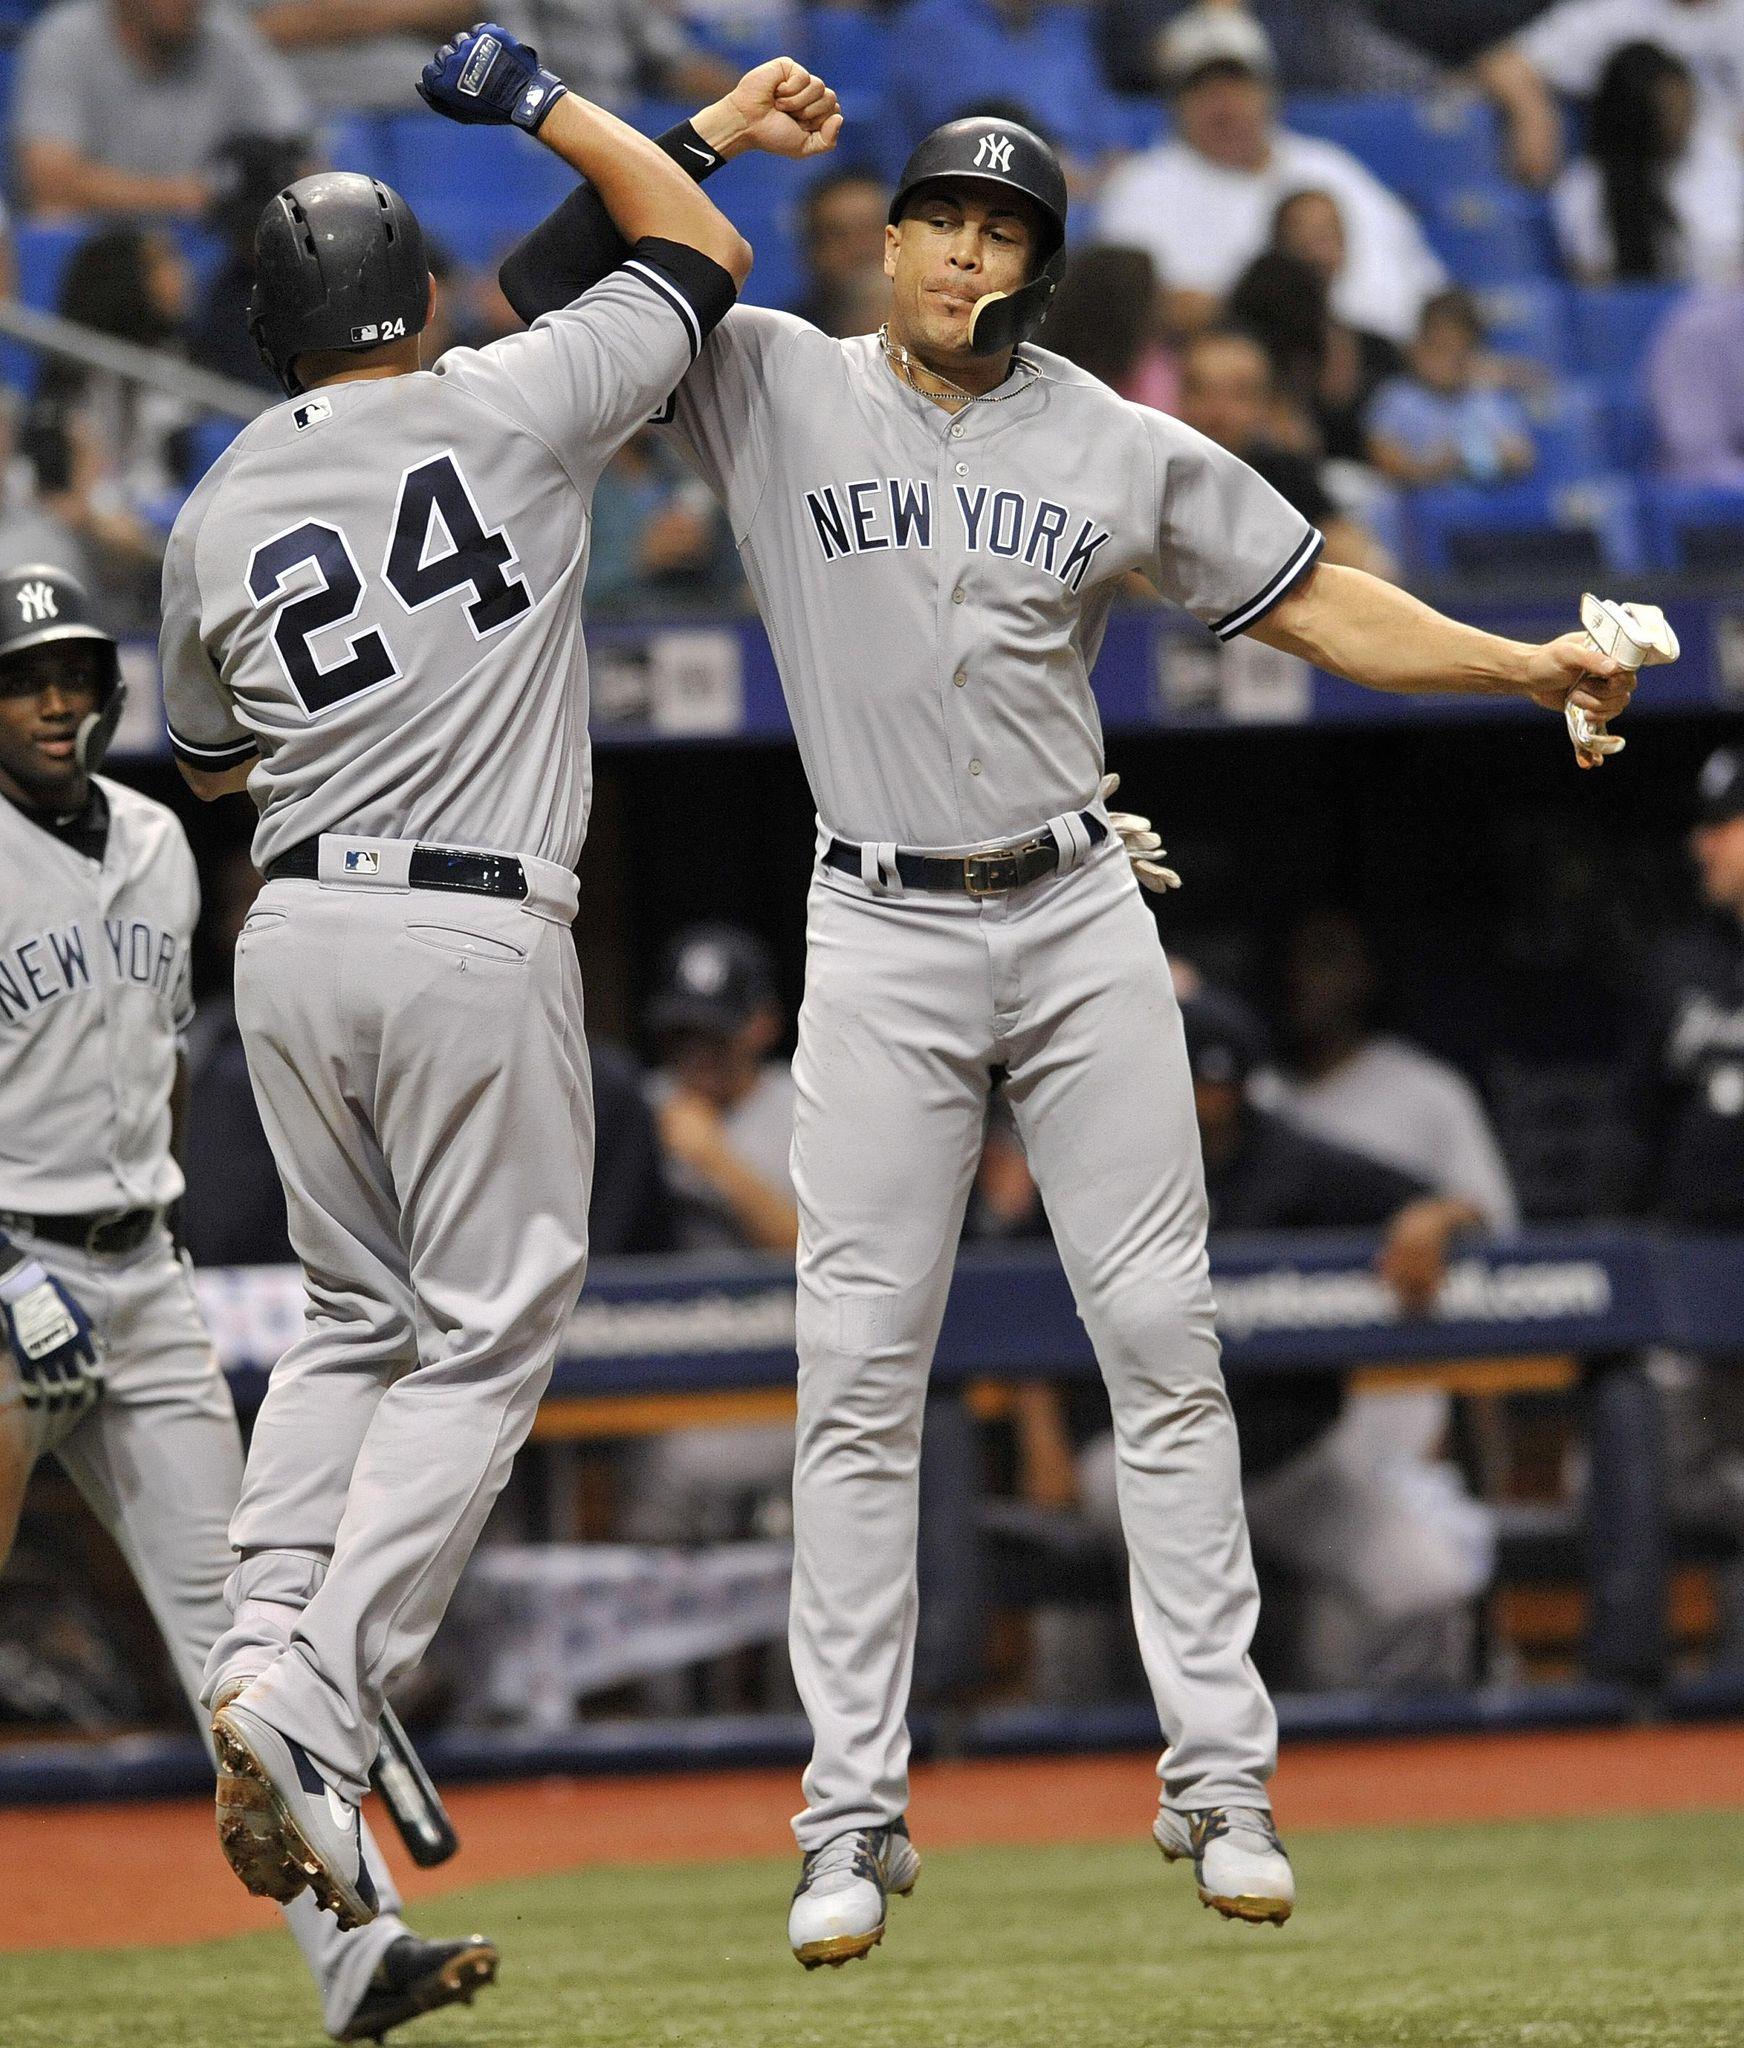 Yankees_rays_baseball_77186_s1744x2048